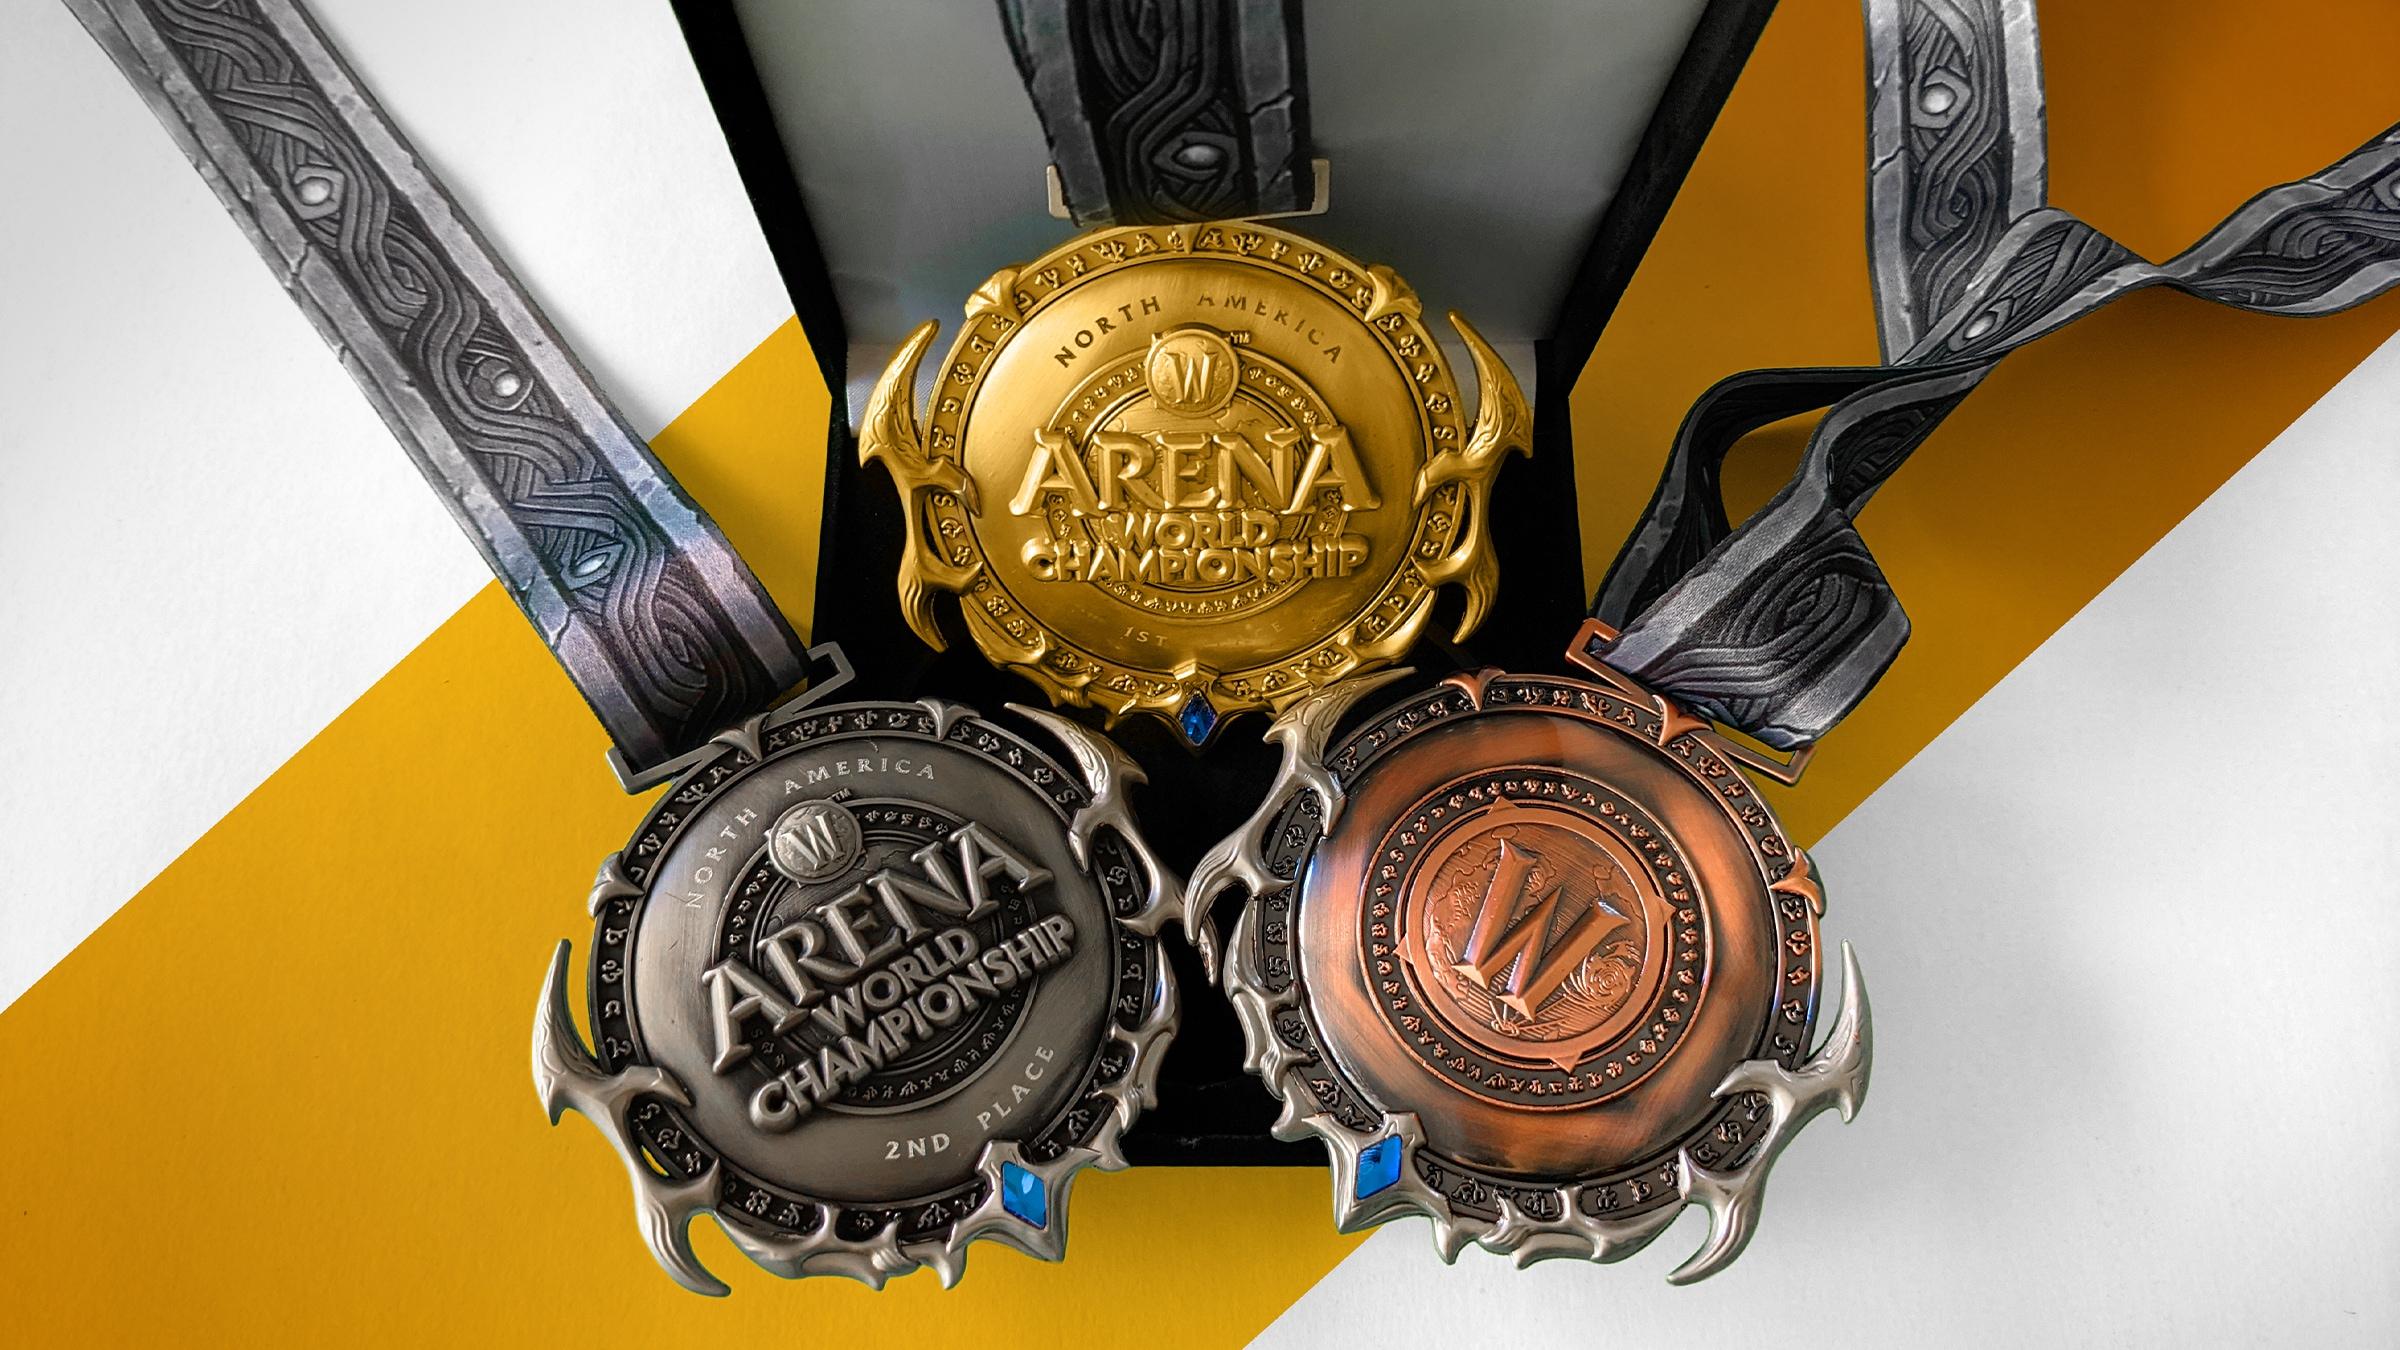 Arena World Championship Season 1 Regional Champions!